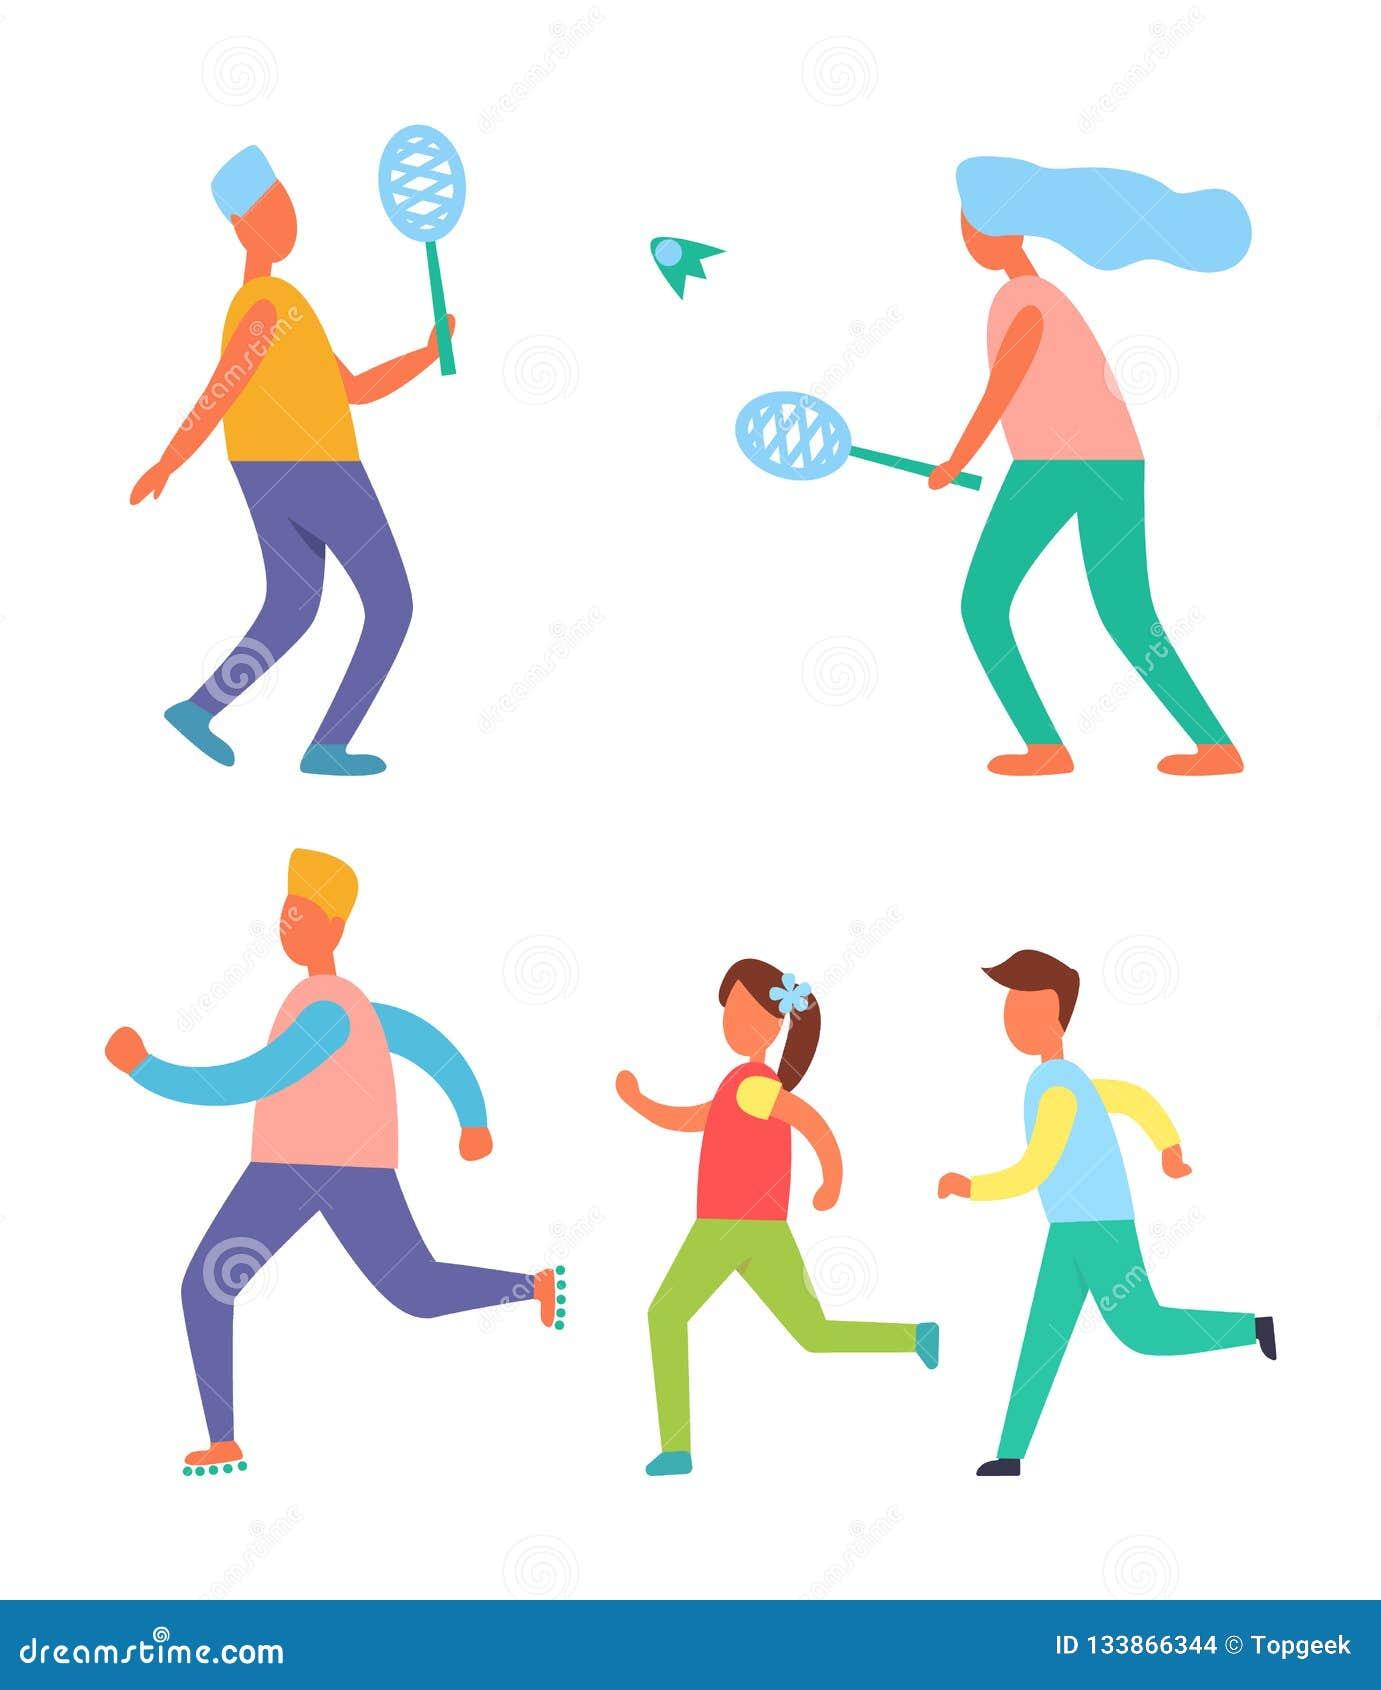 Badminton Training Video Download - livinvelo